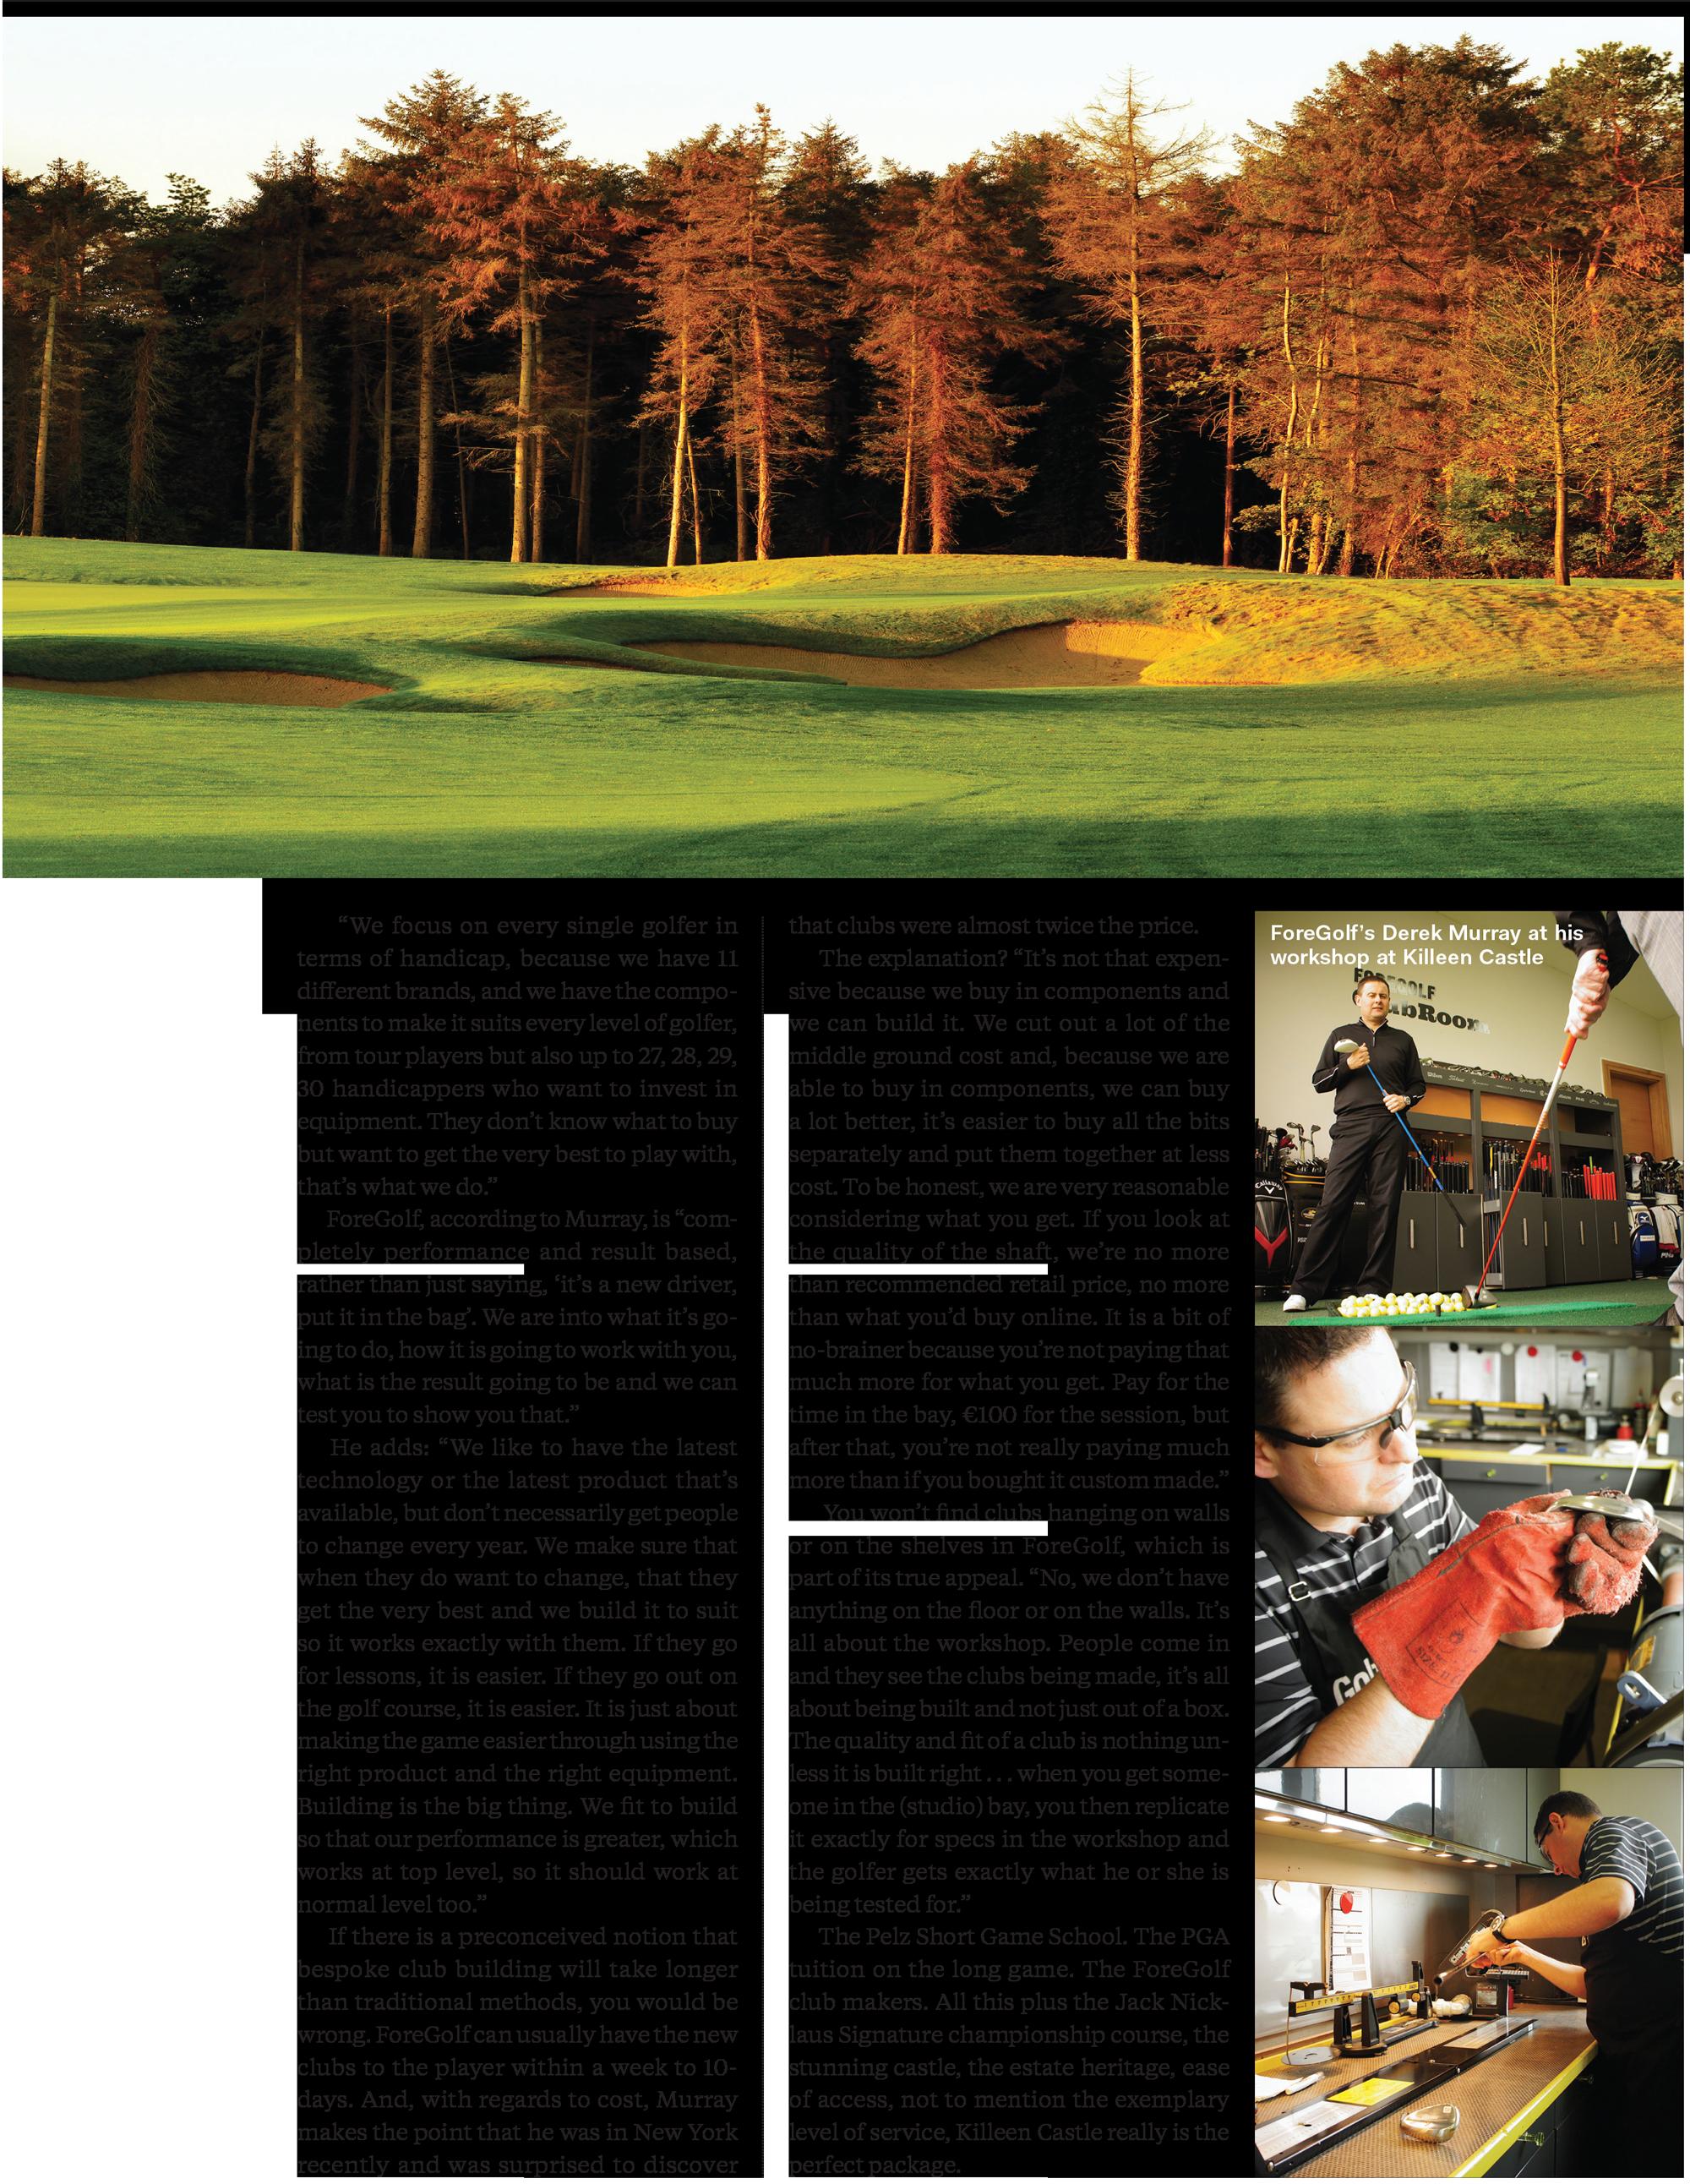 Golf Digest Ireland July Killeen Castle Pelz ForeGolf 2